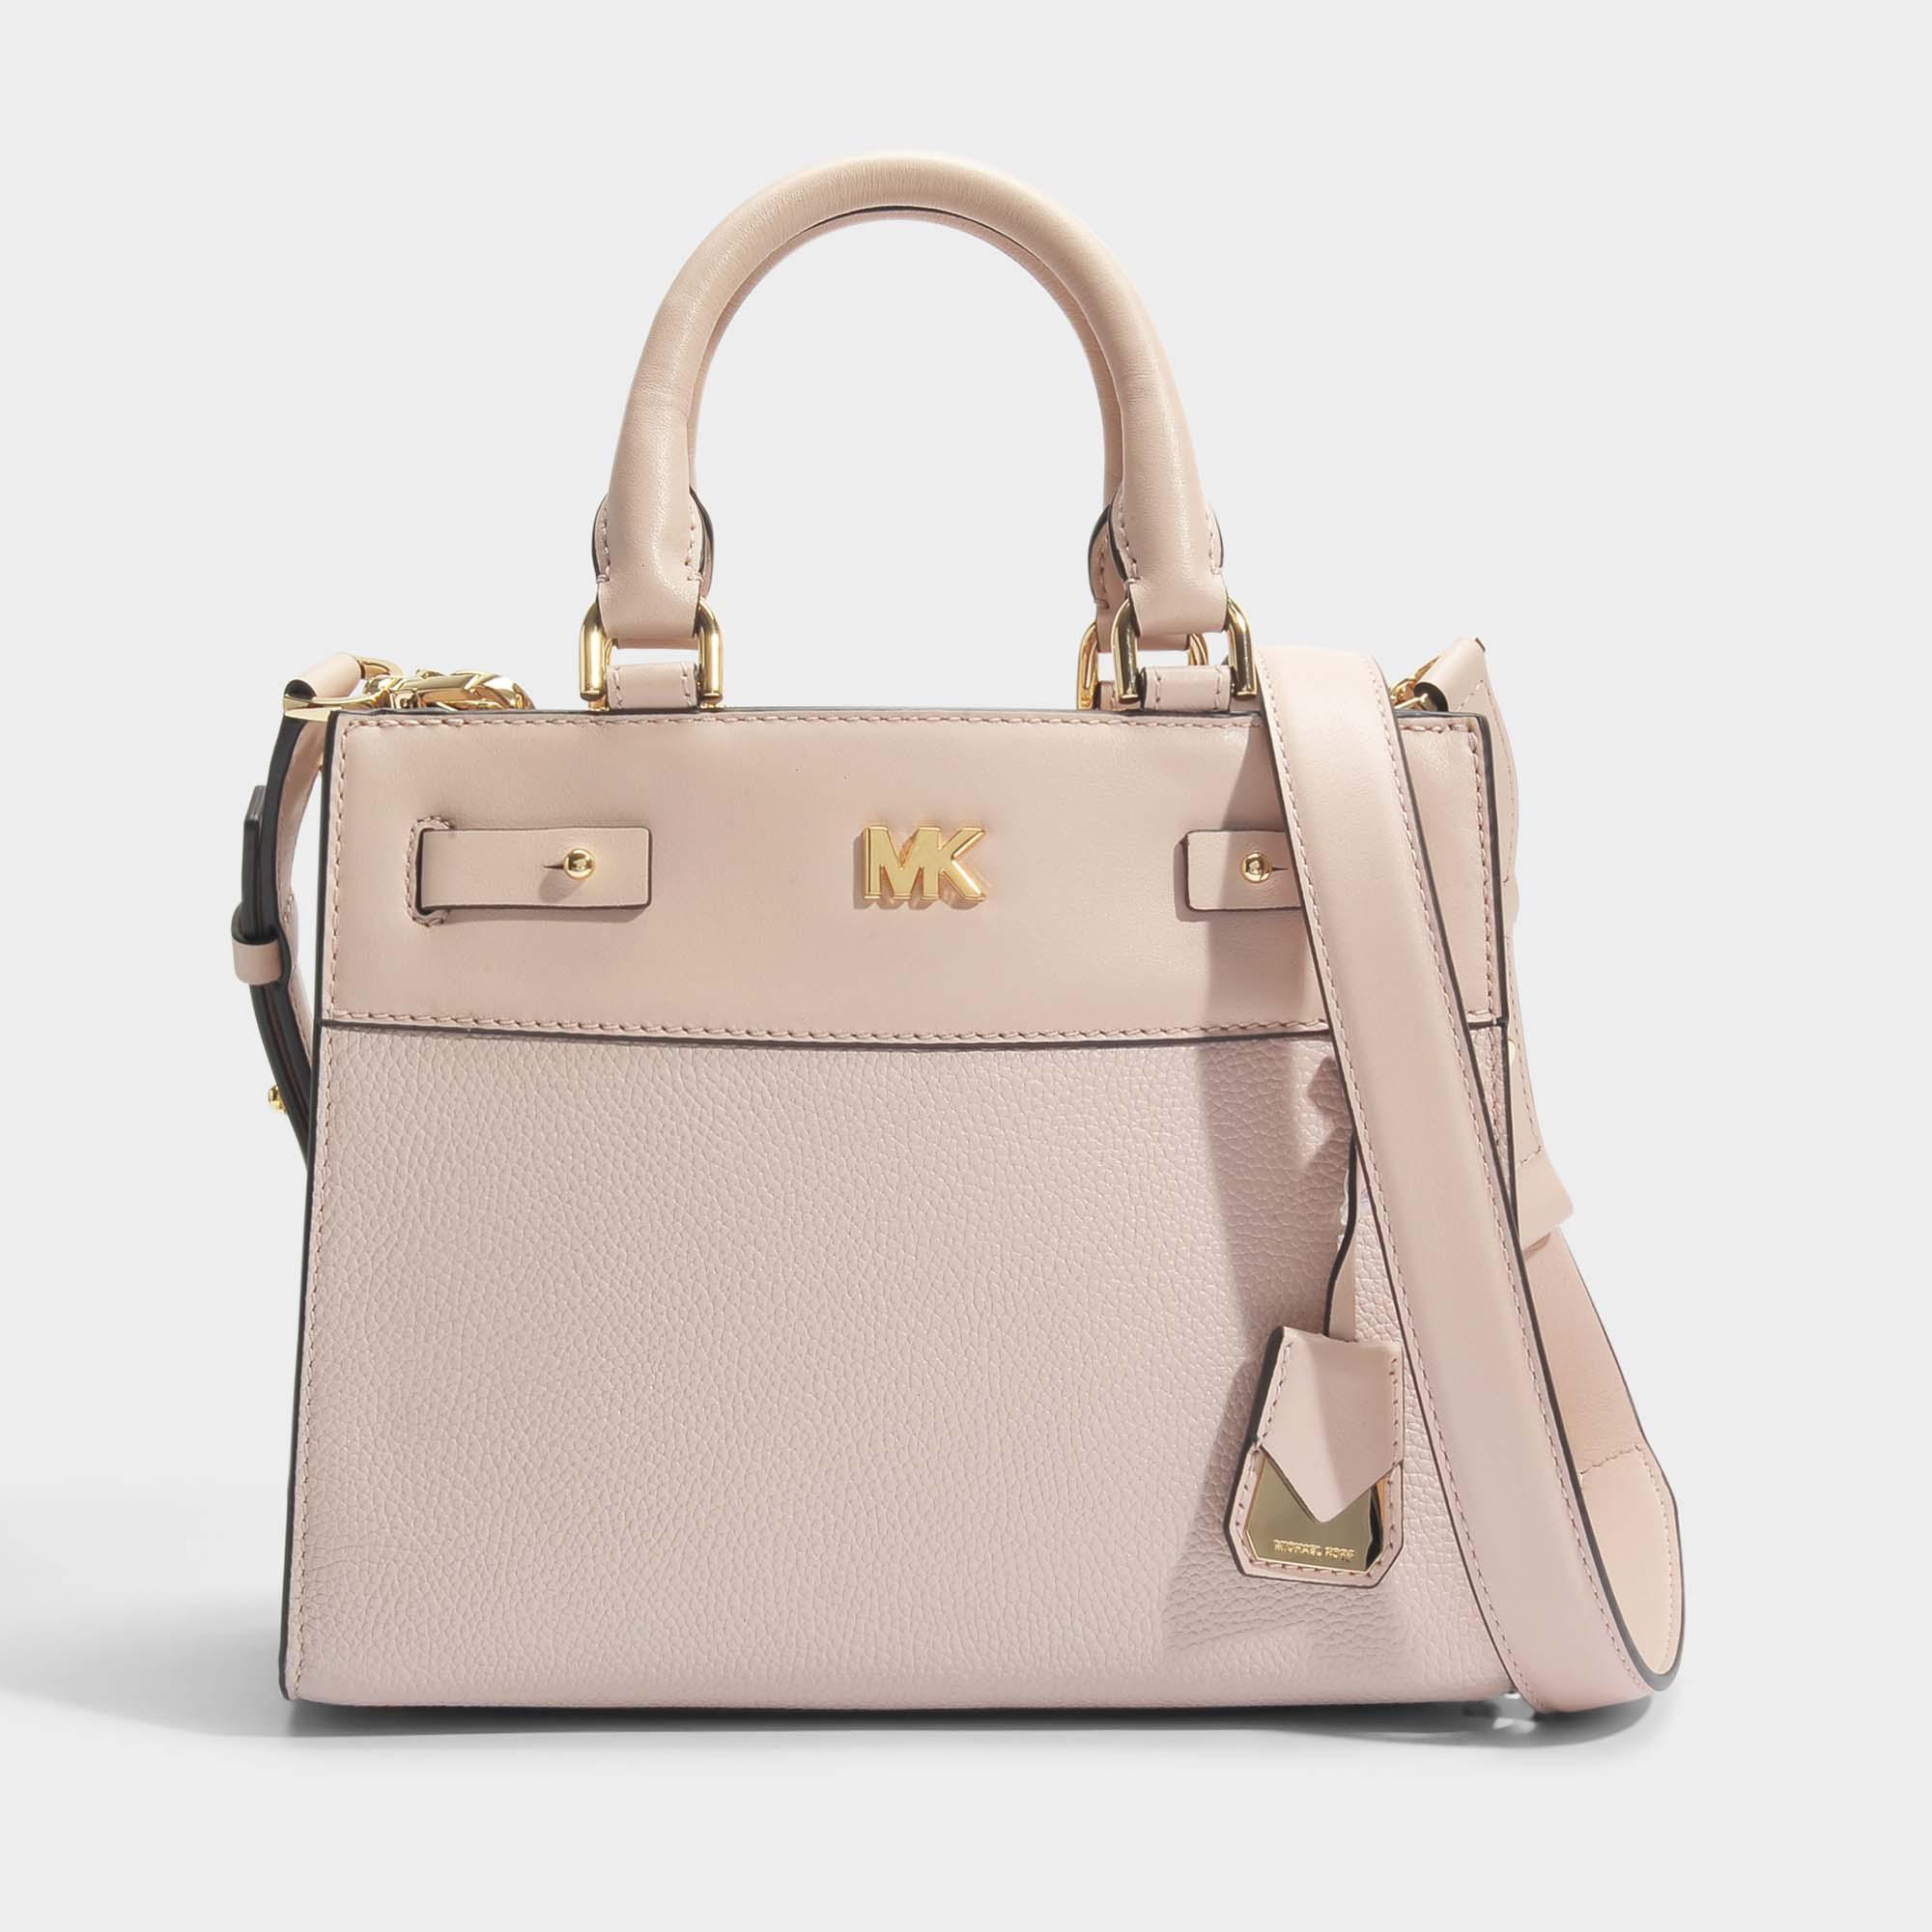 Michael Michael Kors Mott Uptown Mini Messenger Bag in Soft Pink Small Pebble Leather bJRKA5